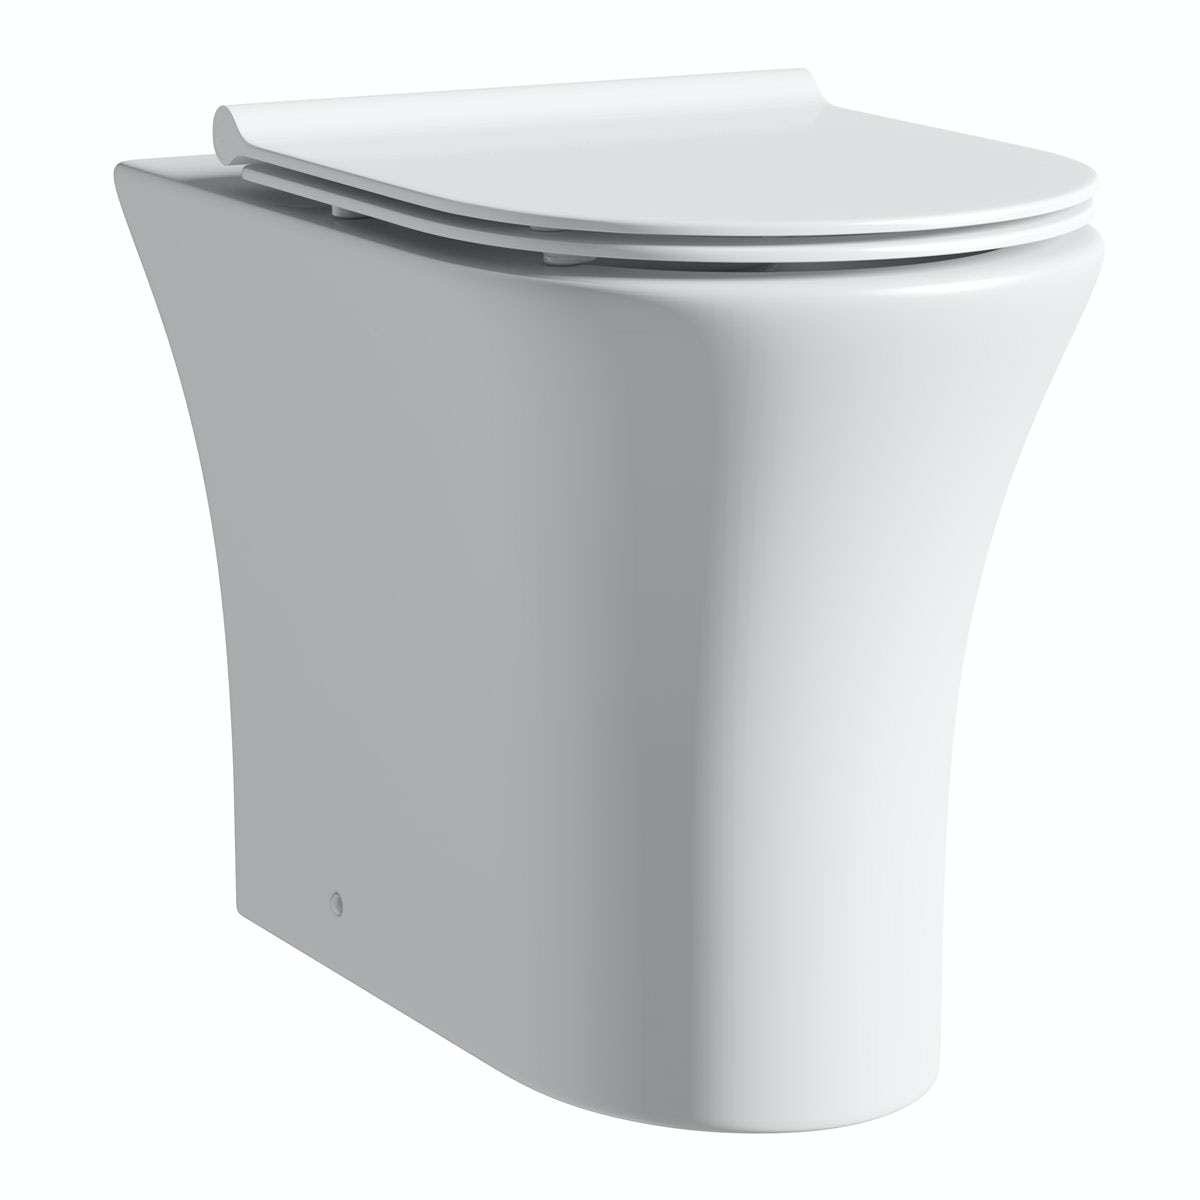 Mode Hardy back to wall toilet inc slimline soft close seat